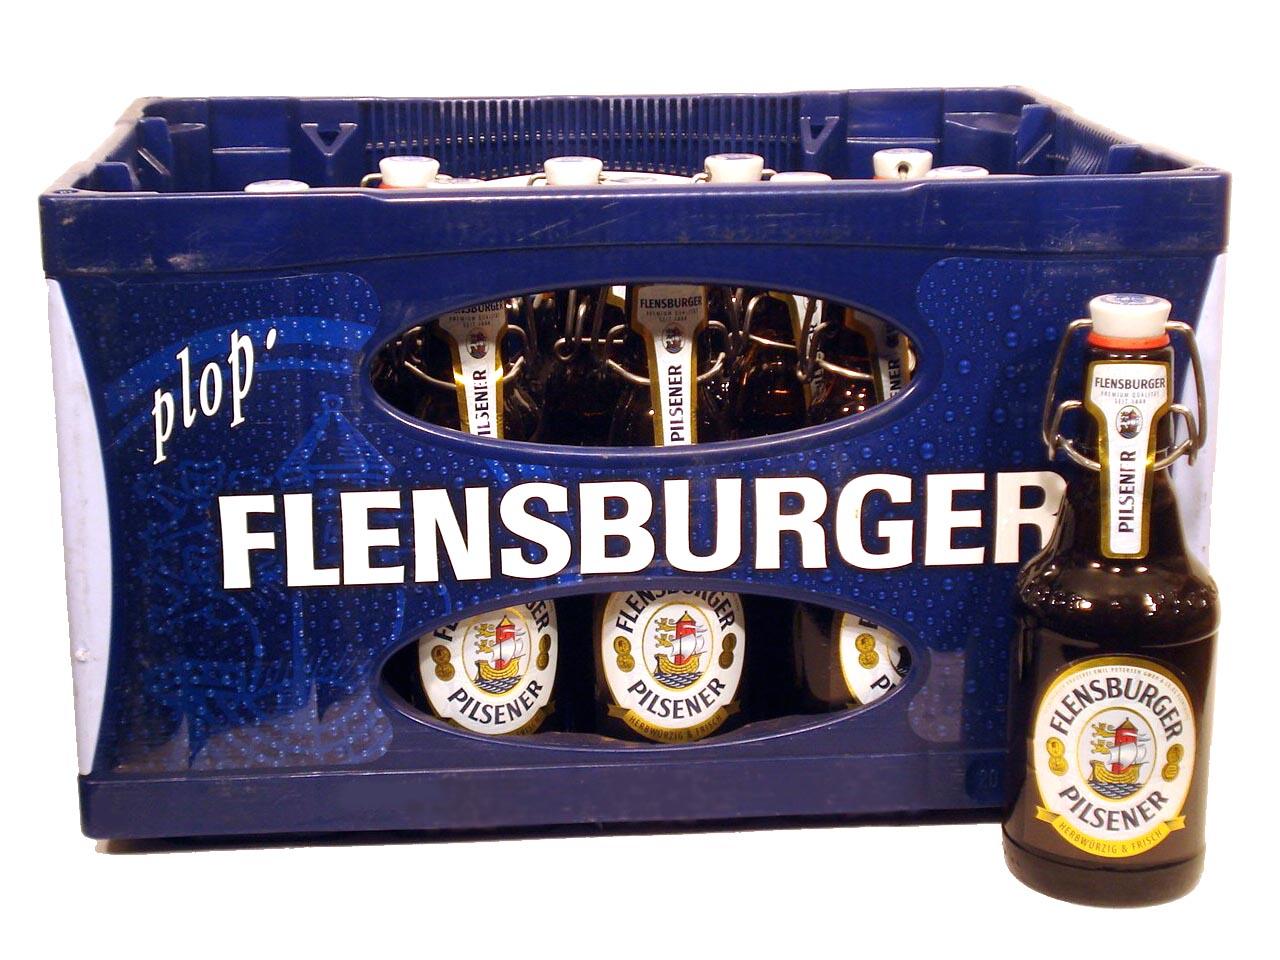 081044568_flensburger_pils_kiste_mit_20_flaschen_a_033l_123_143lo.jpg